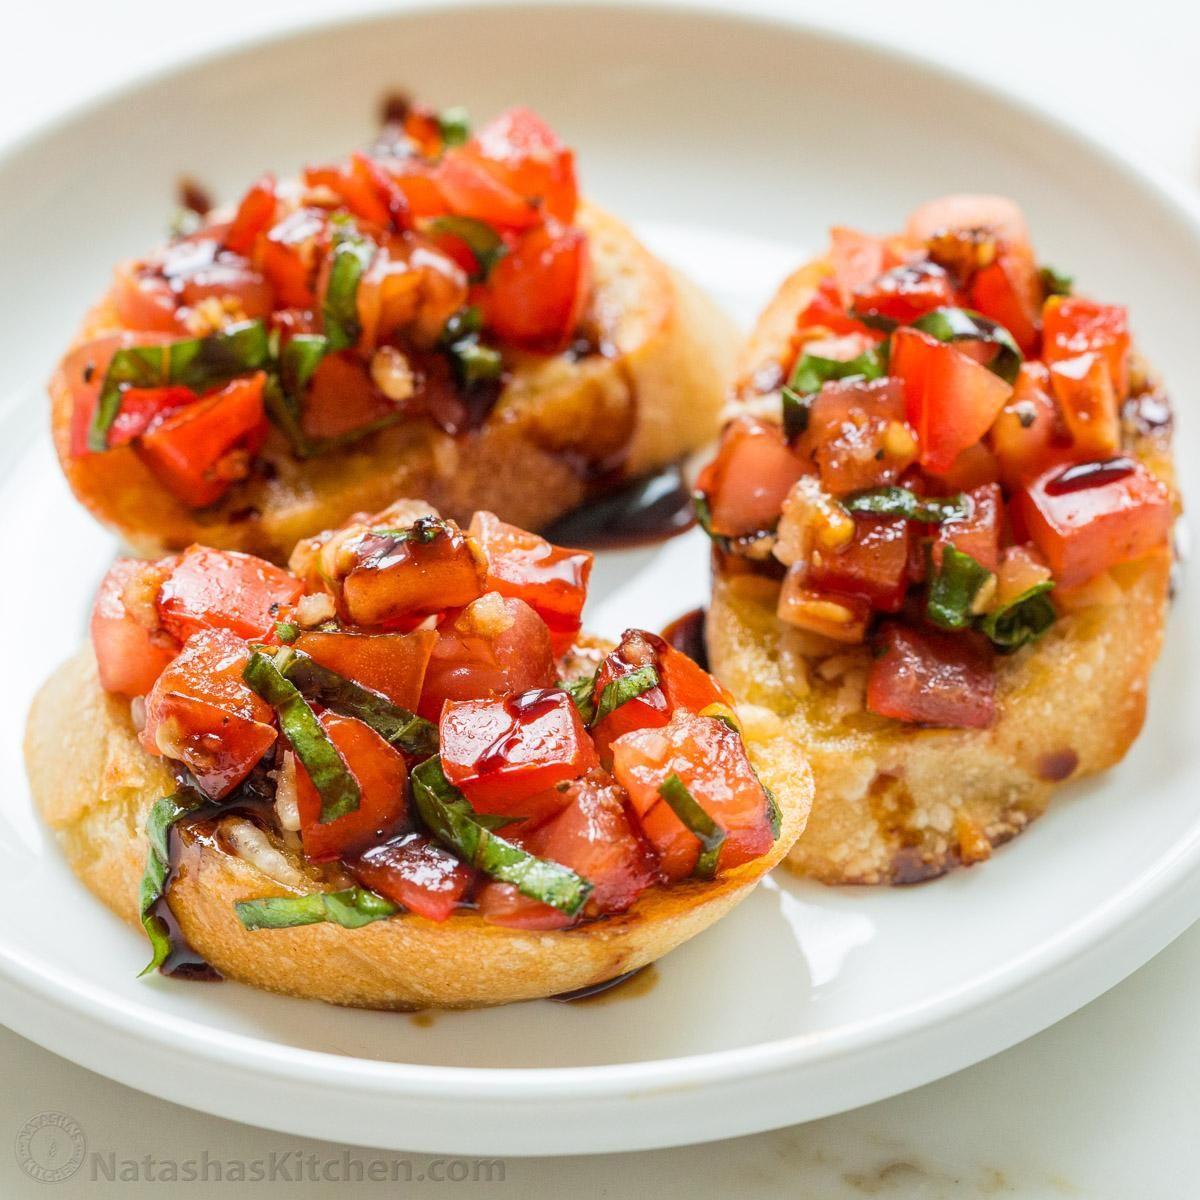 Classic Italian Bruschetta with Tomatos